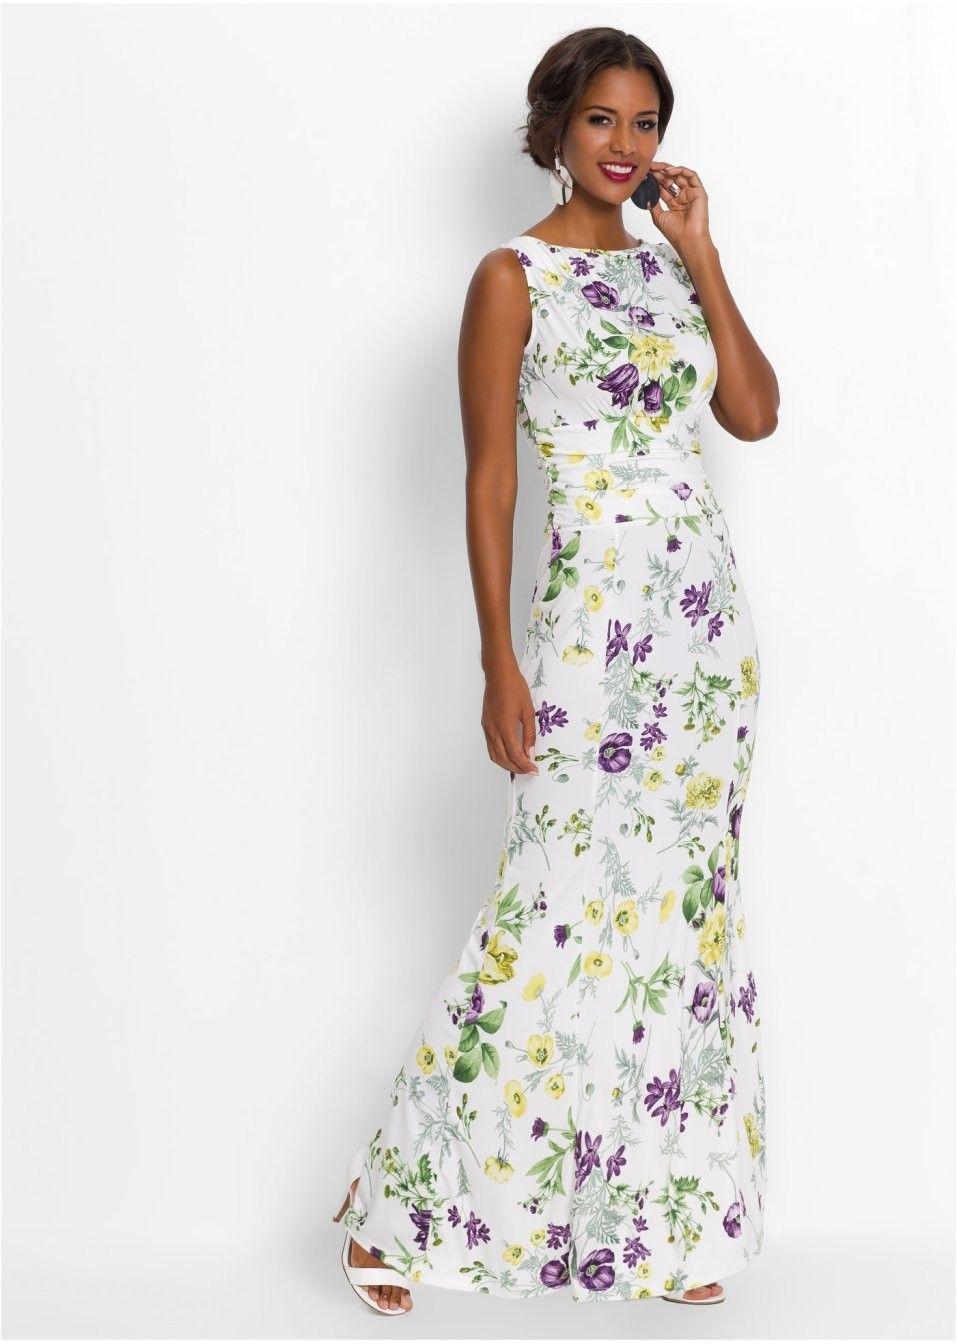 8626b6a70b23e Lillelise mustriga kleit - Naistele - BonPrix   Heegeldamine ...